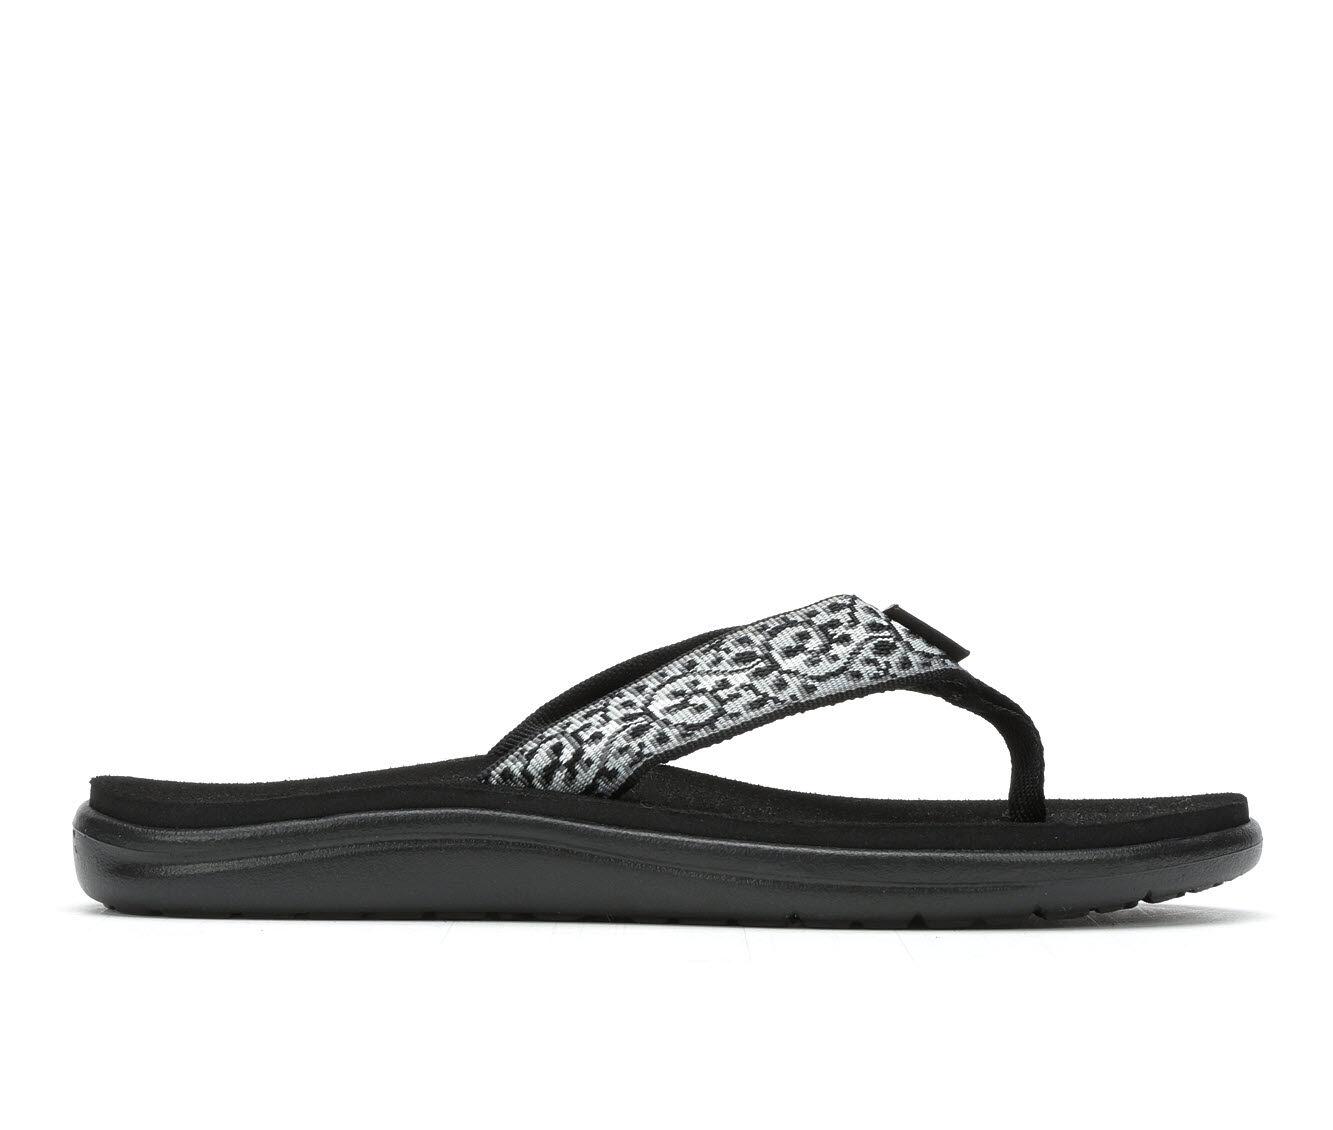 Women's Teva Voya Flip W Sandals Black/White